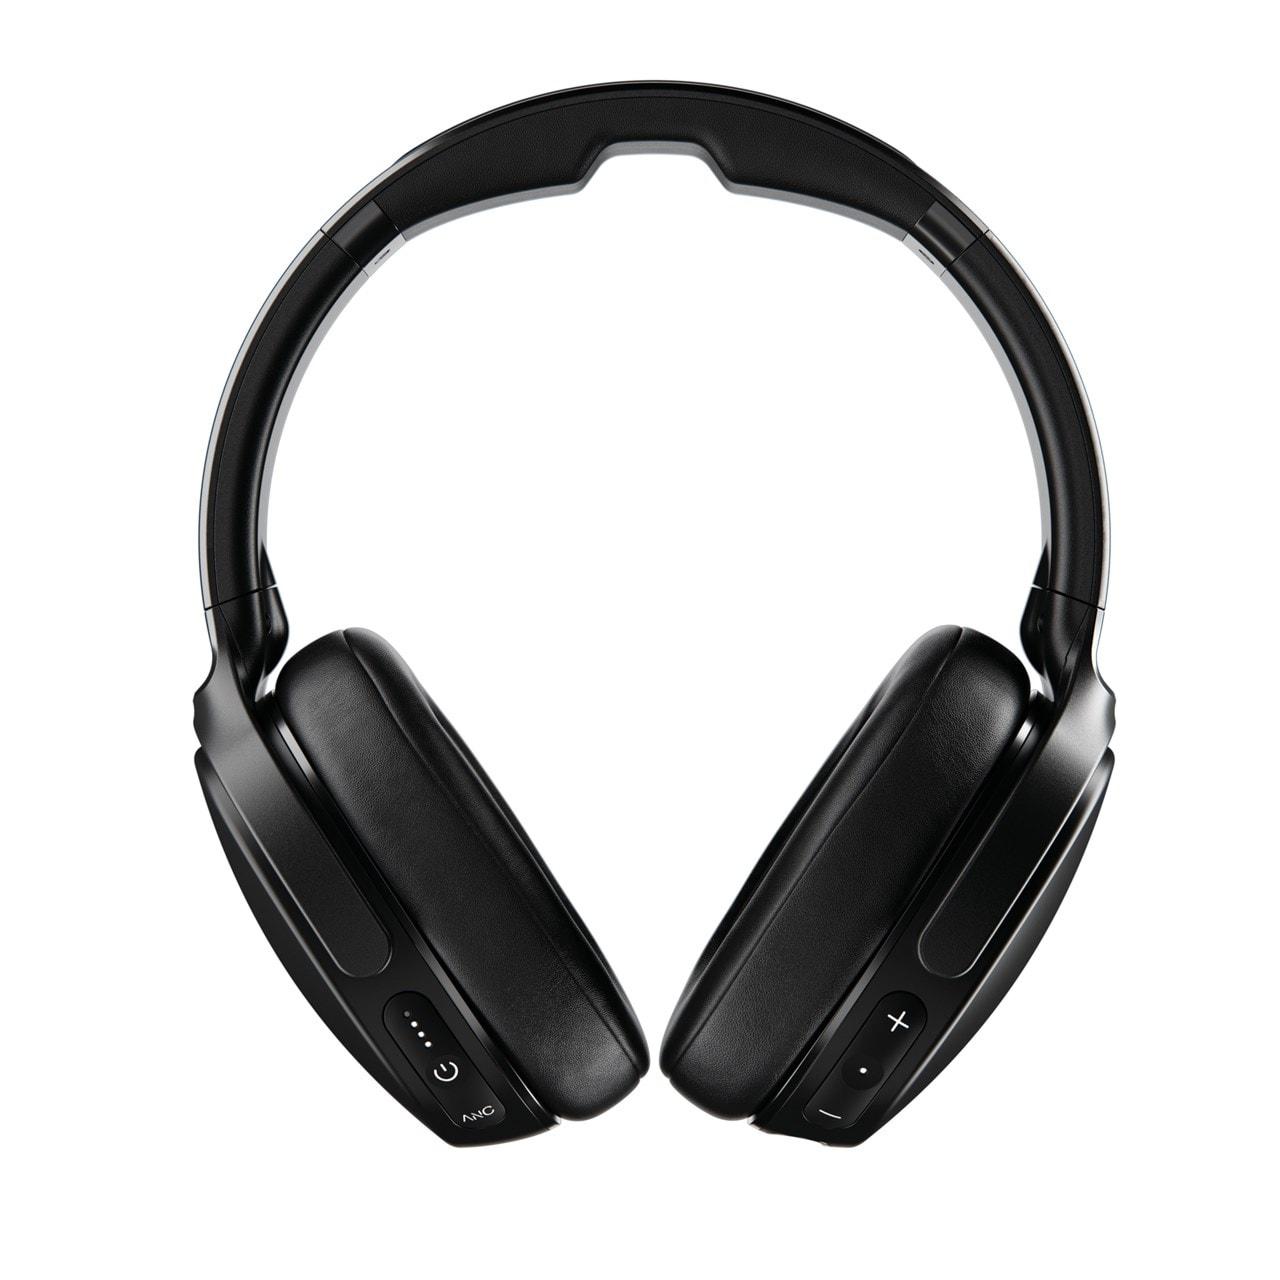 Skullcandy Venue Black Active Noise Cancelling Bluetooth Headphones - 1